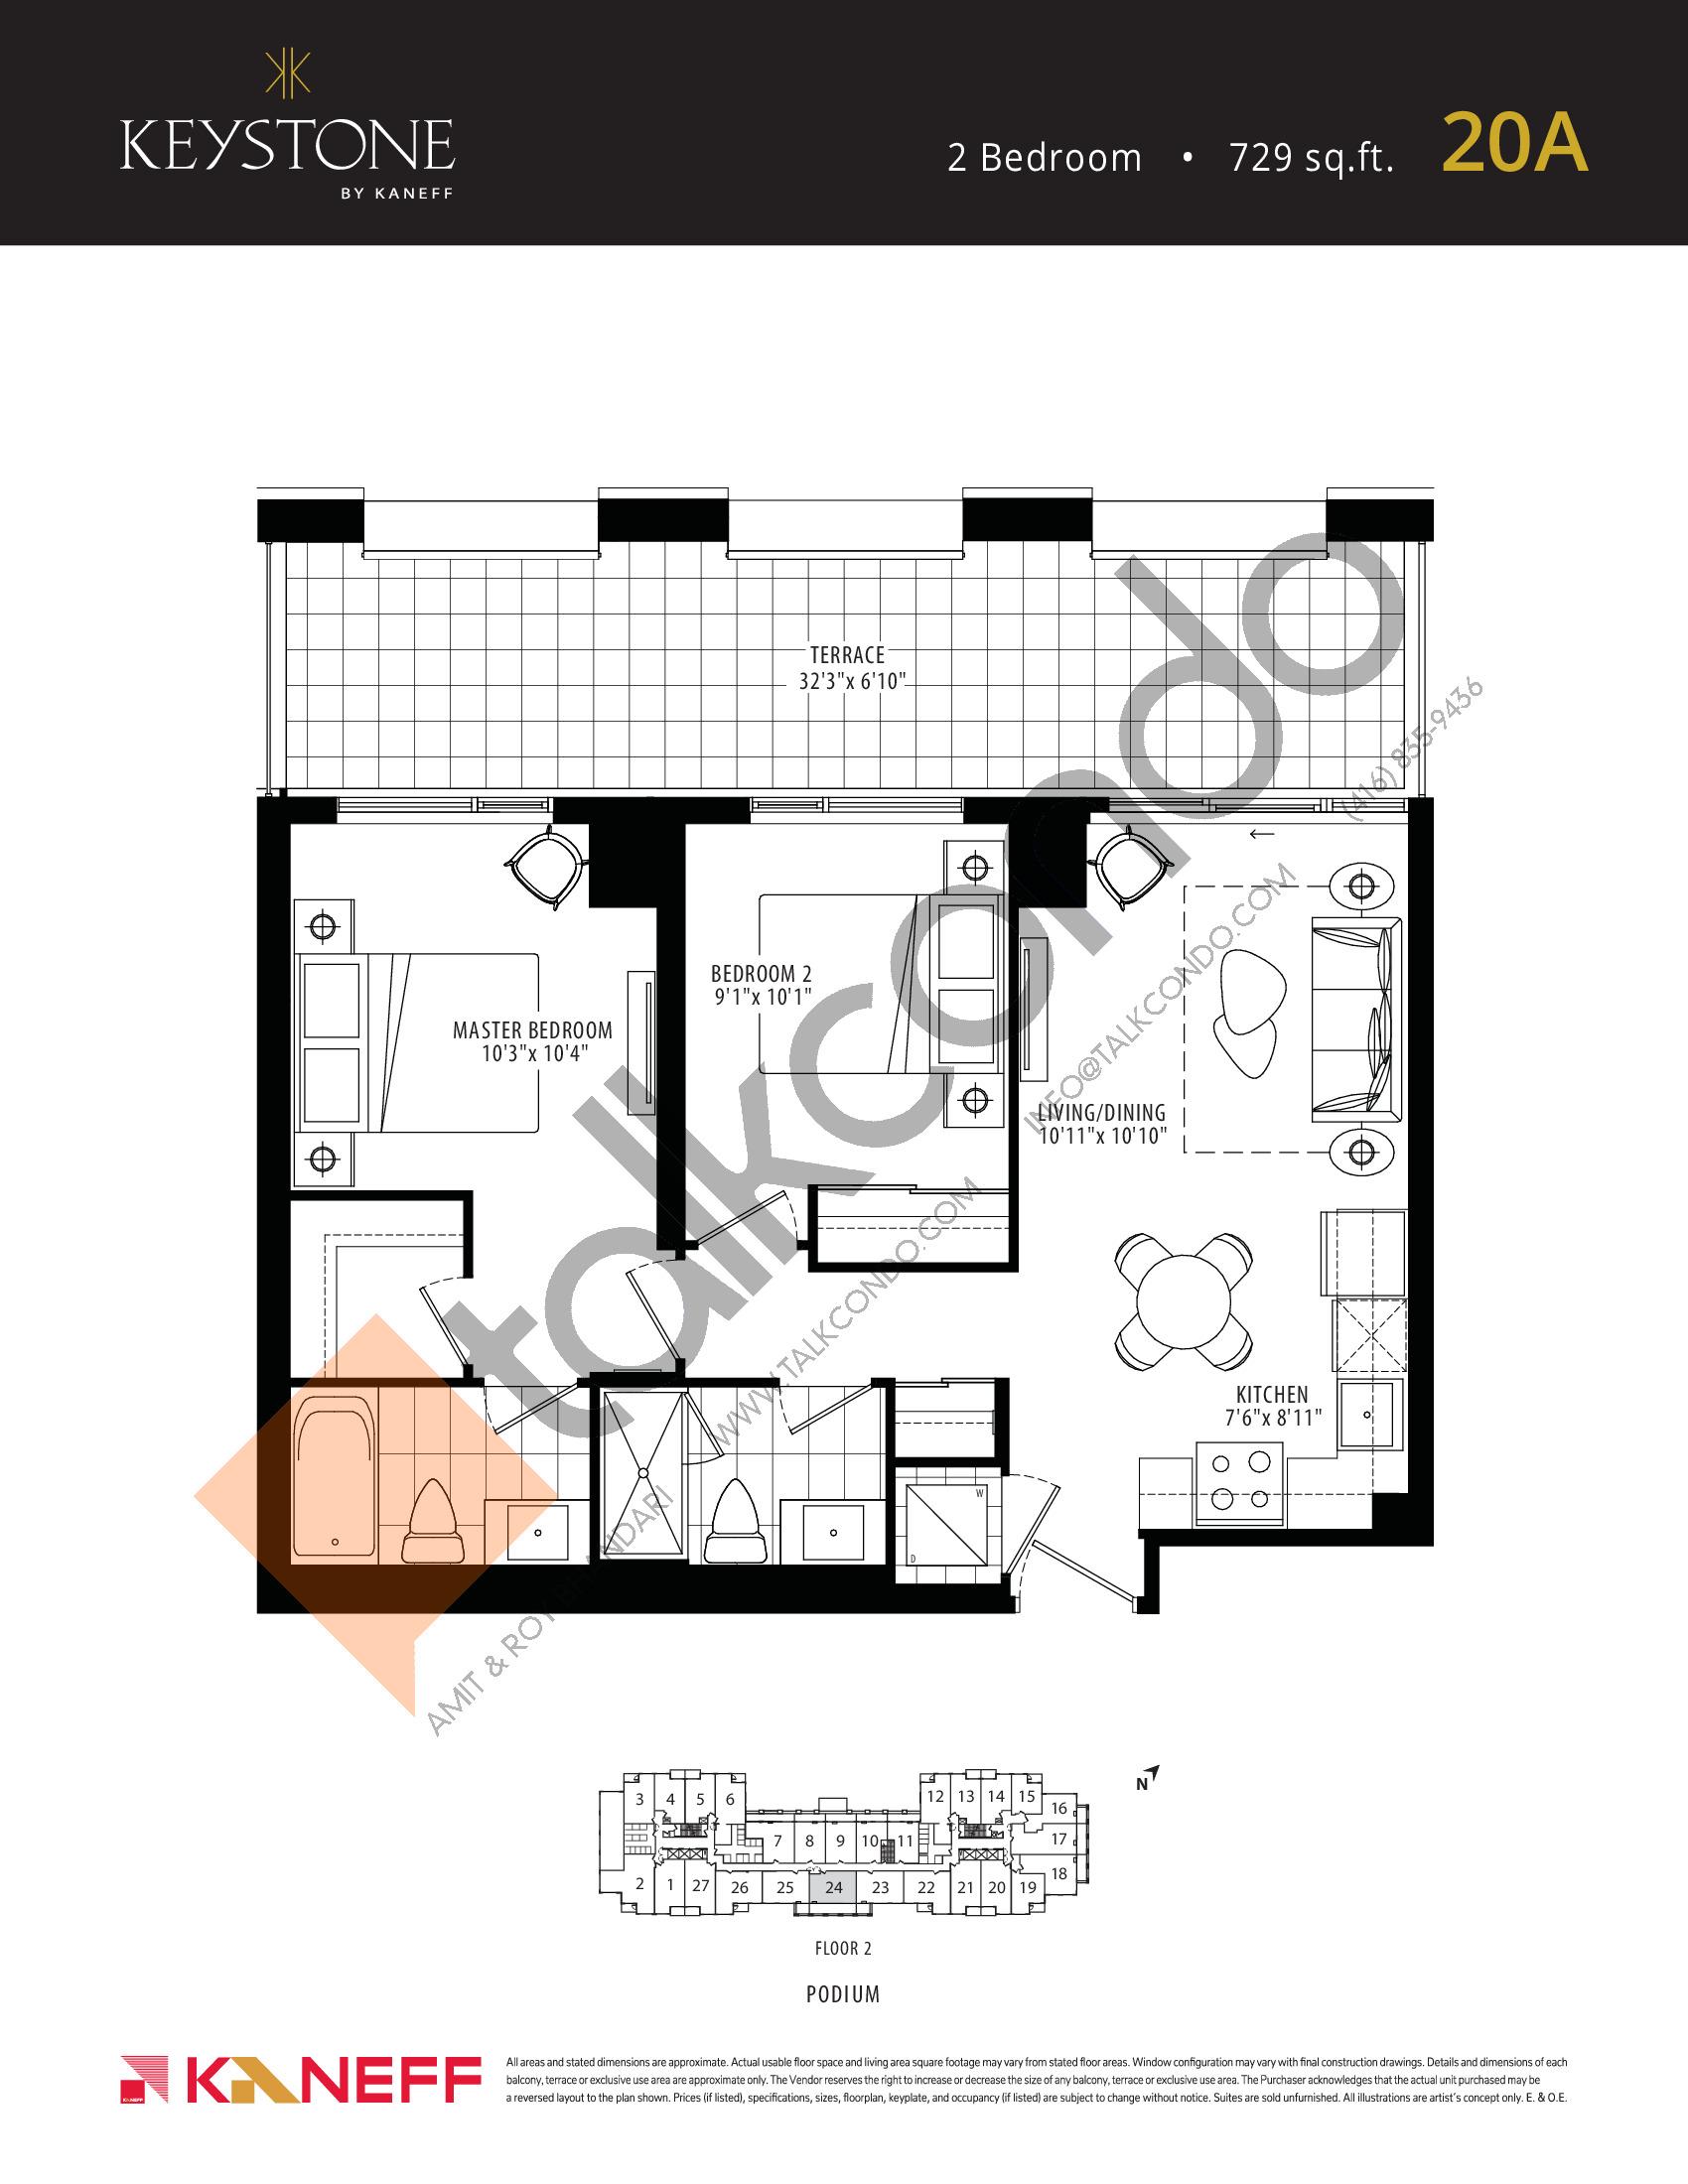 20A Floor Plan at Keystone Condos Phase 2 - 729 sq.ft